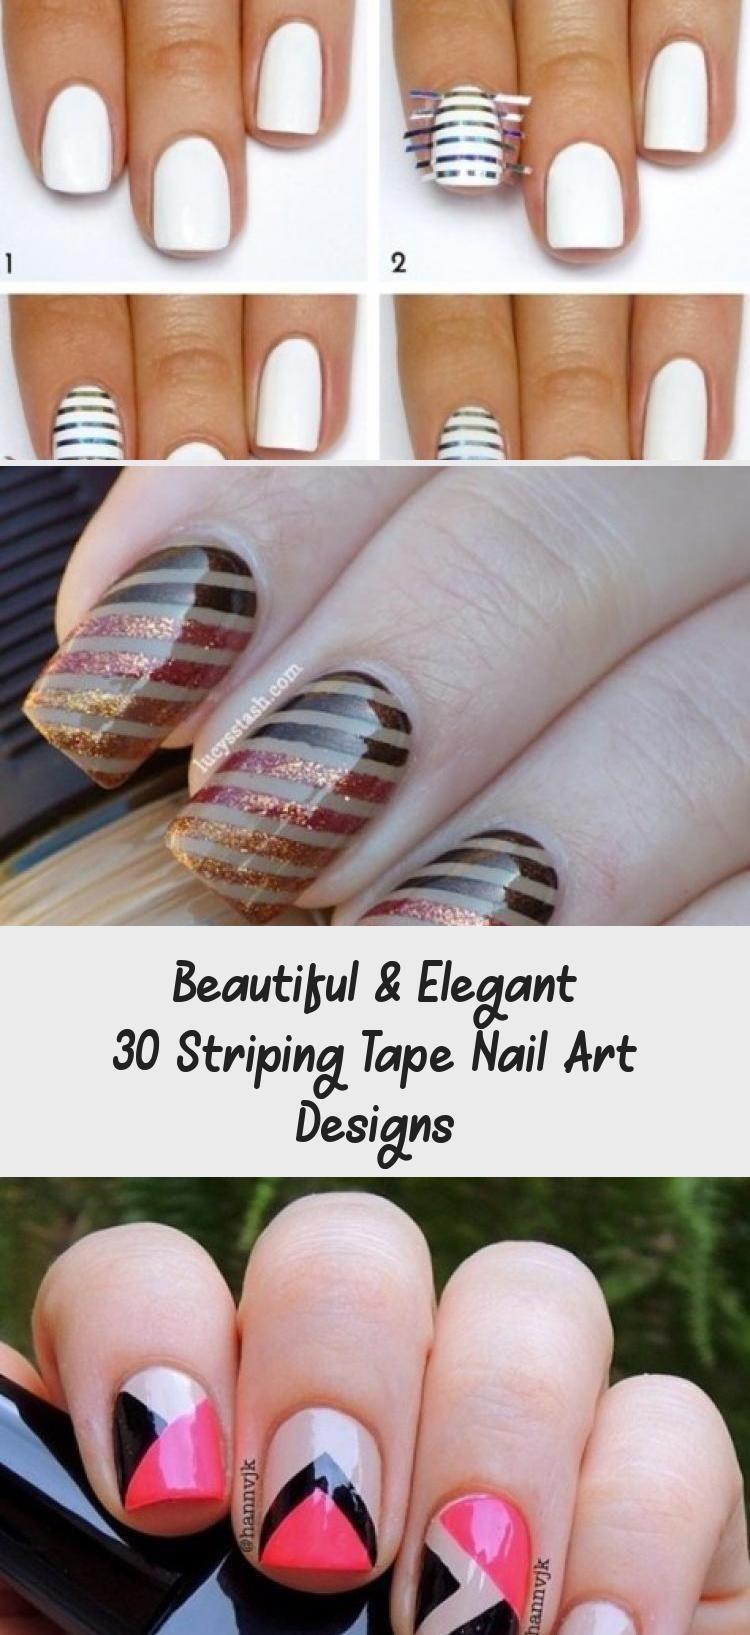 Beautiful Elegant 30 Striping Tape Nail Art Designs Tape Nail